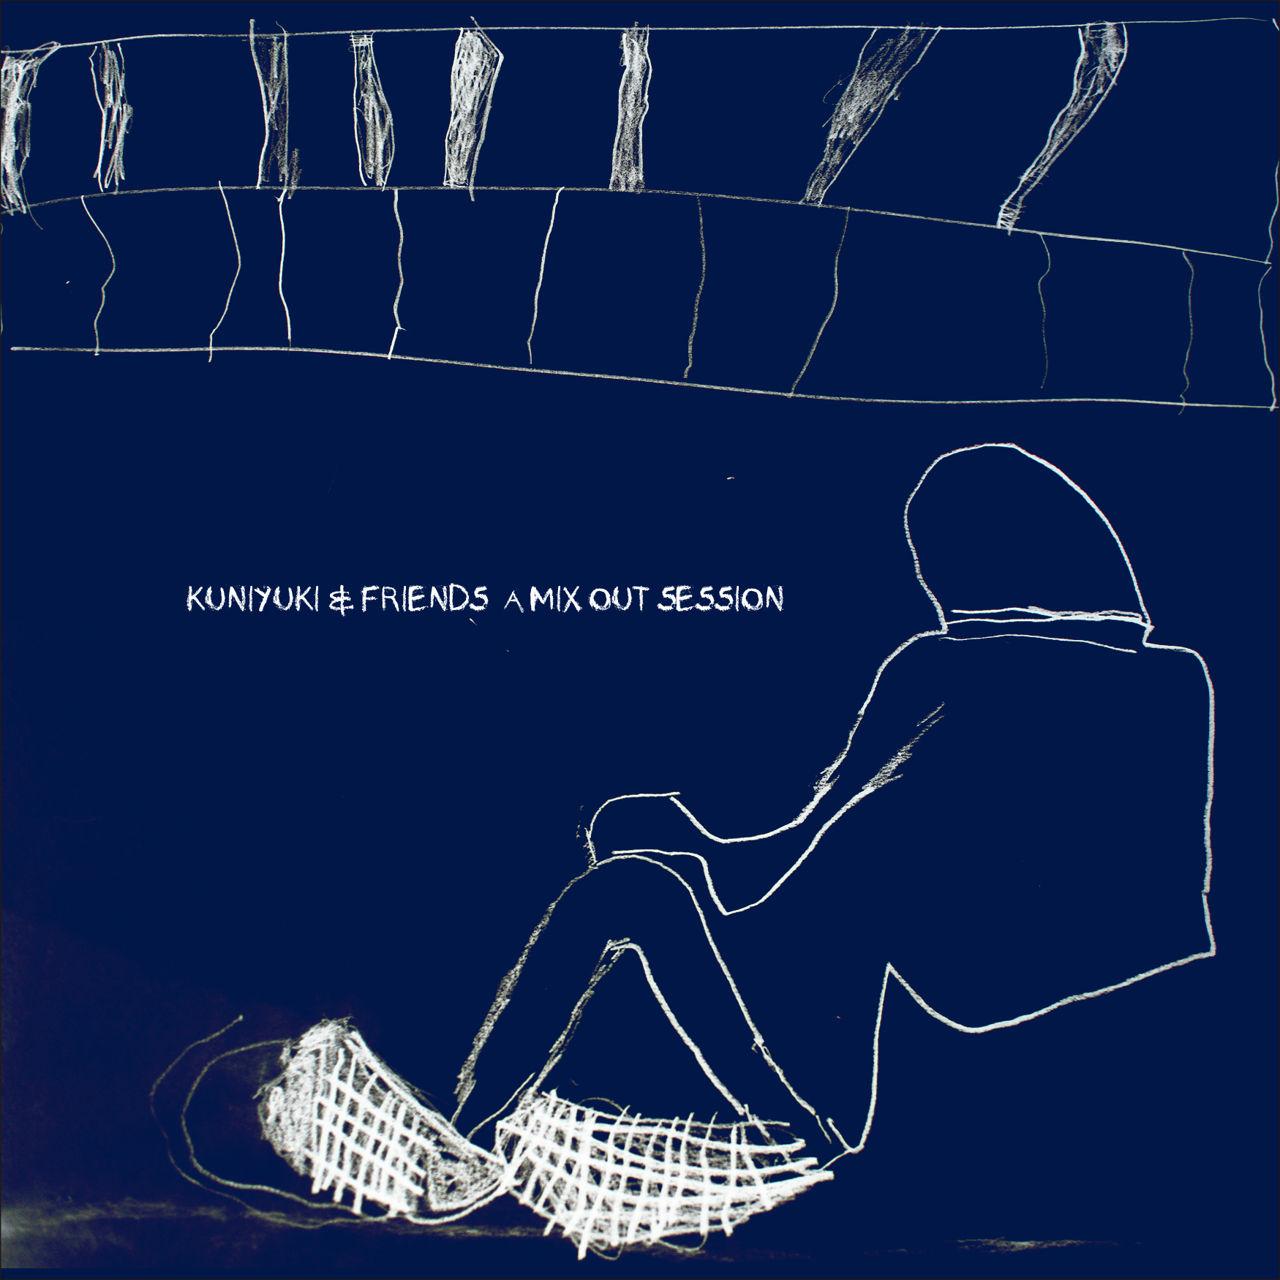 Kuniyuki & Friends/A MIX OUT SESSION CD